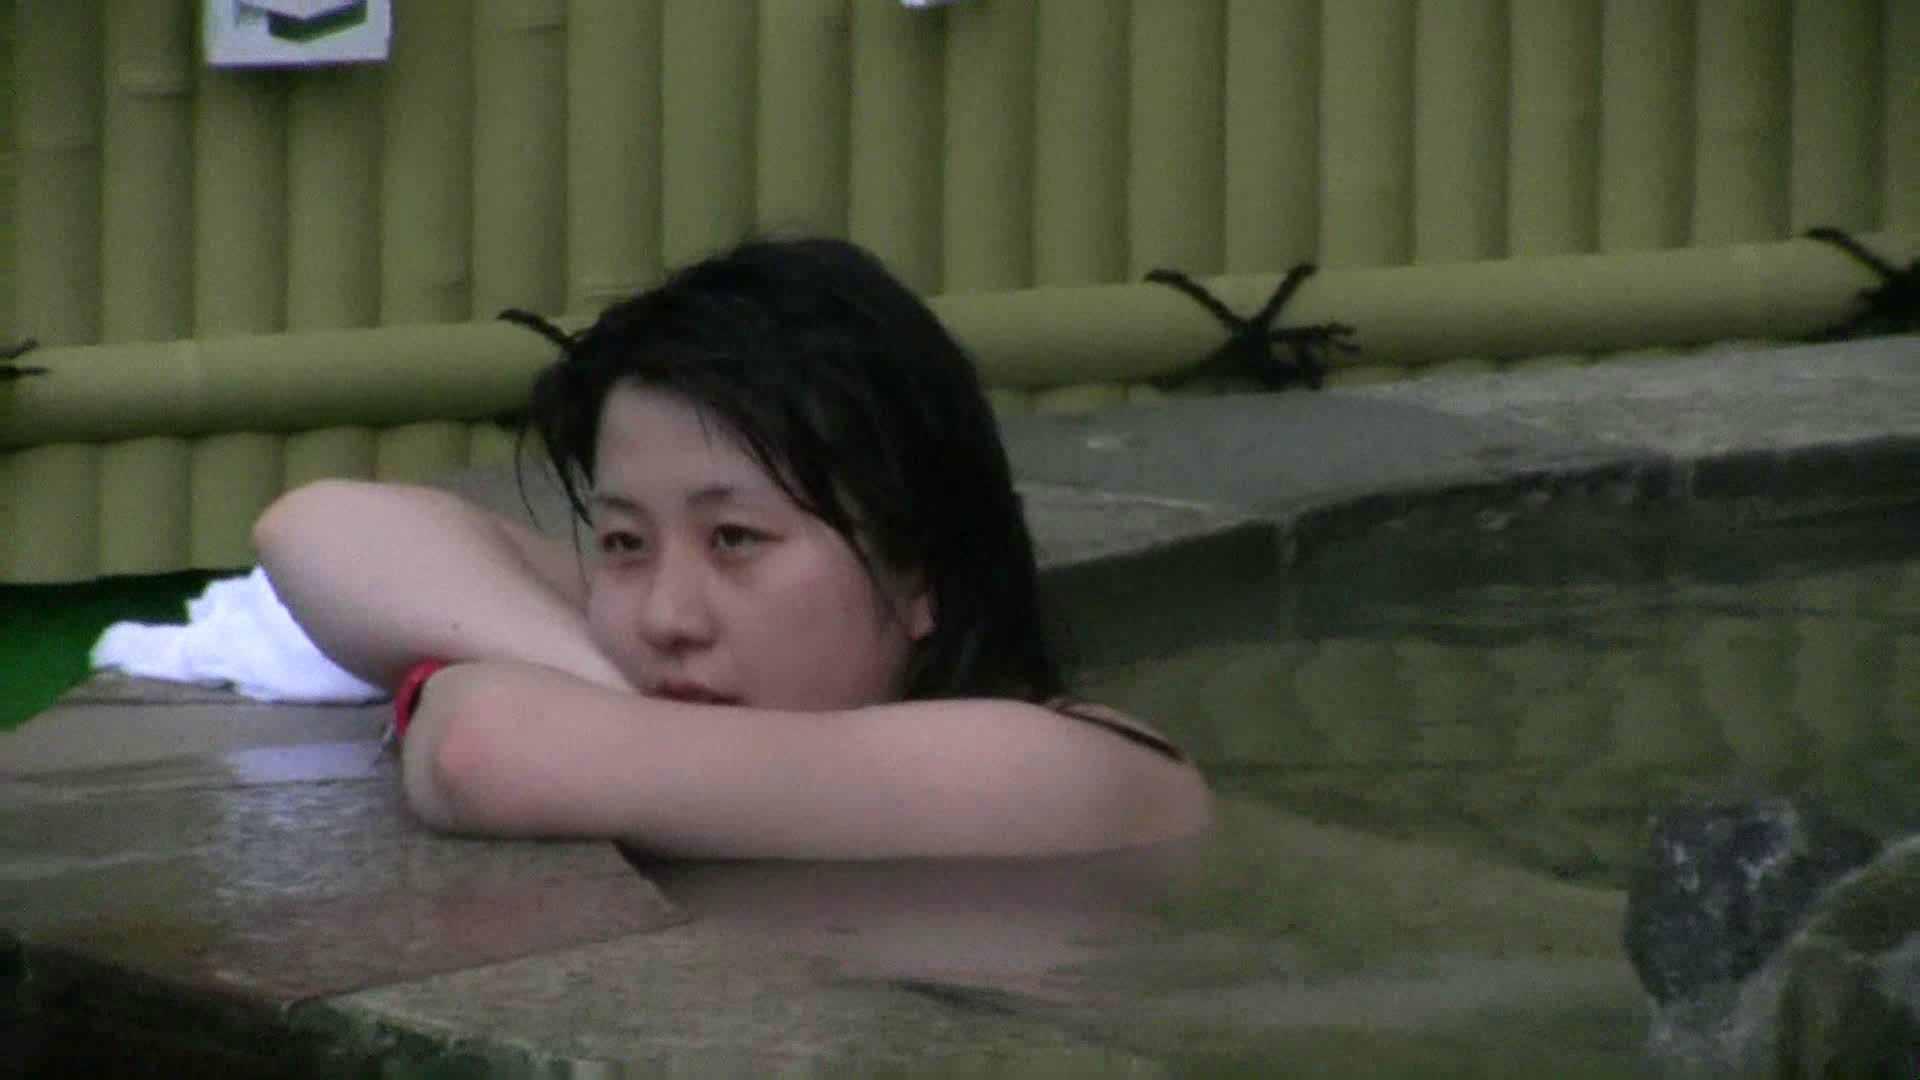 Aquaな露天風呂Vol.541 露天風呂編  88PIX 56